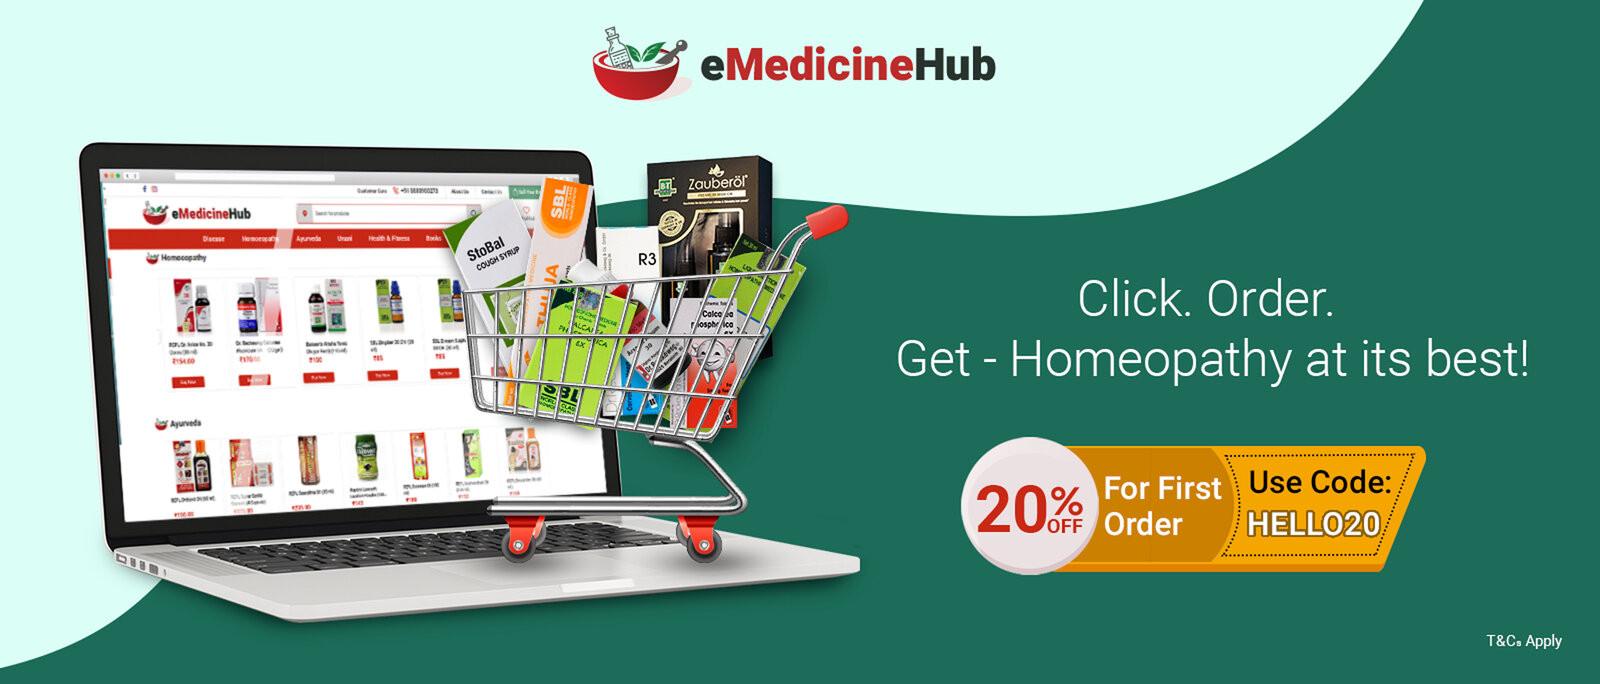 Buy Homeopathy Medicines Online